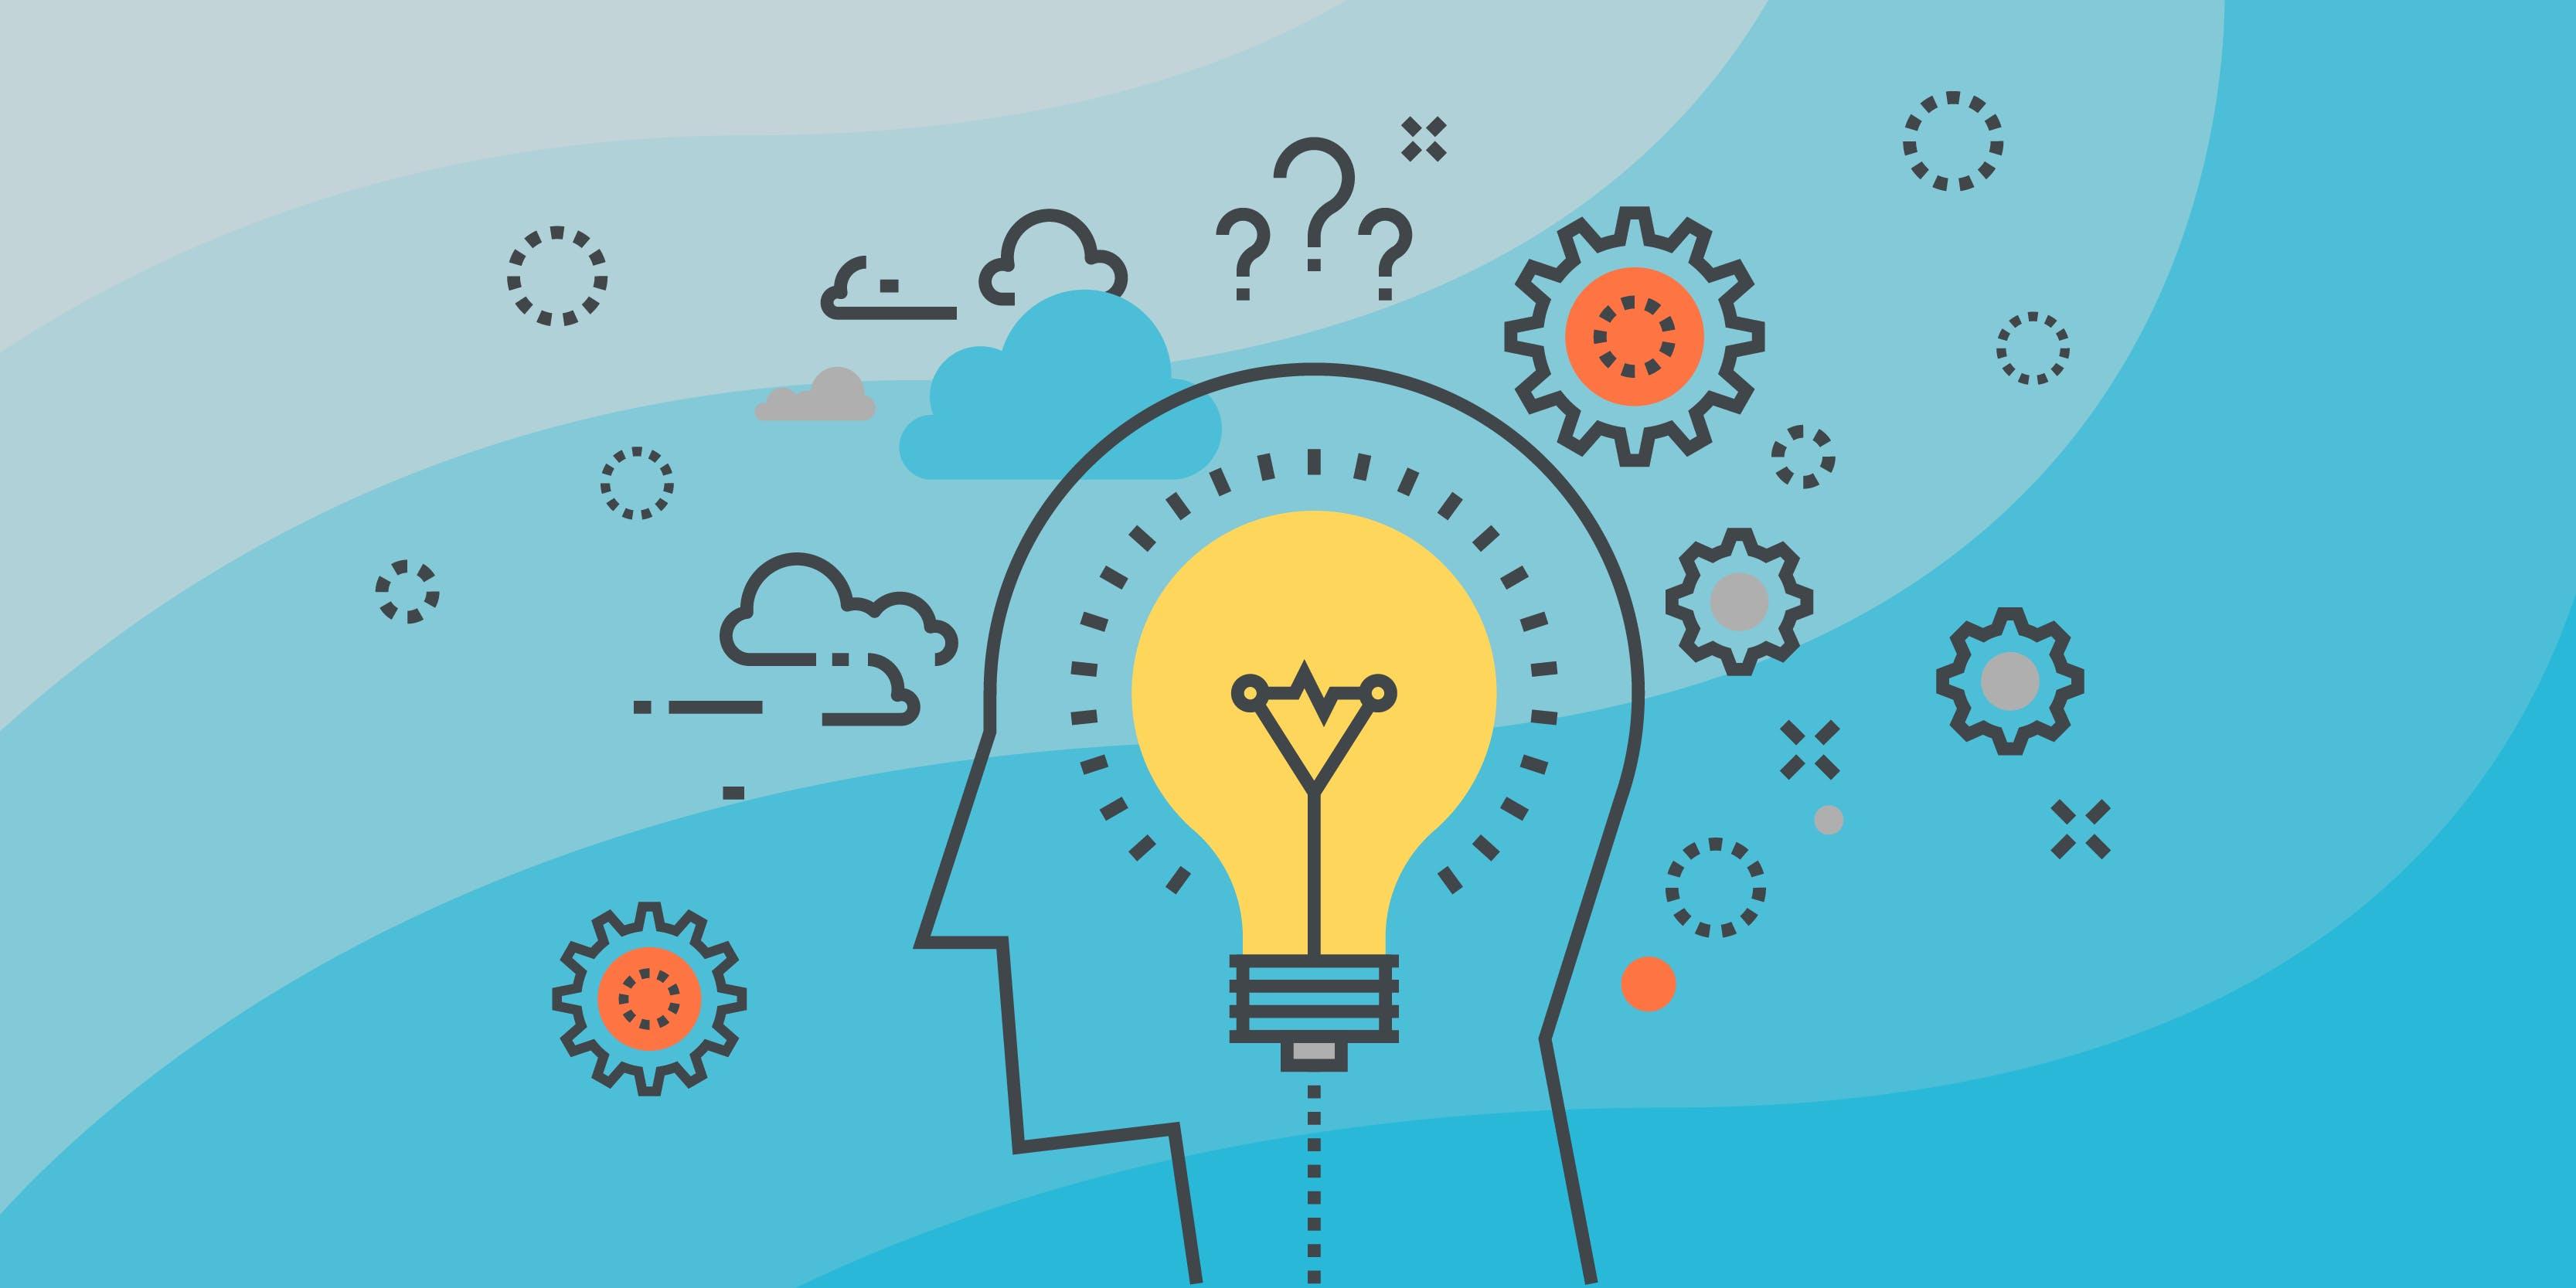 design-thinking-business-success